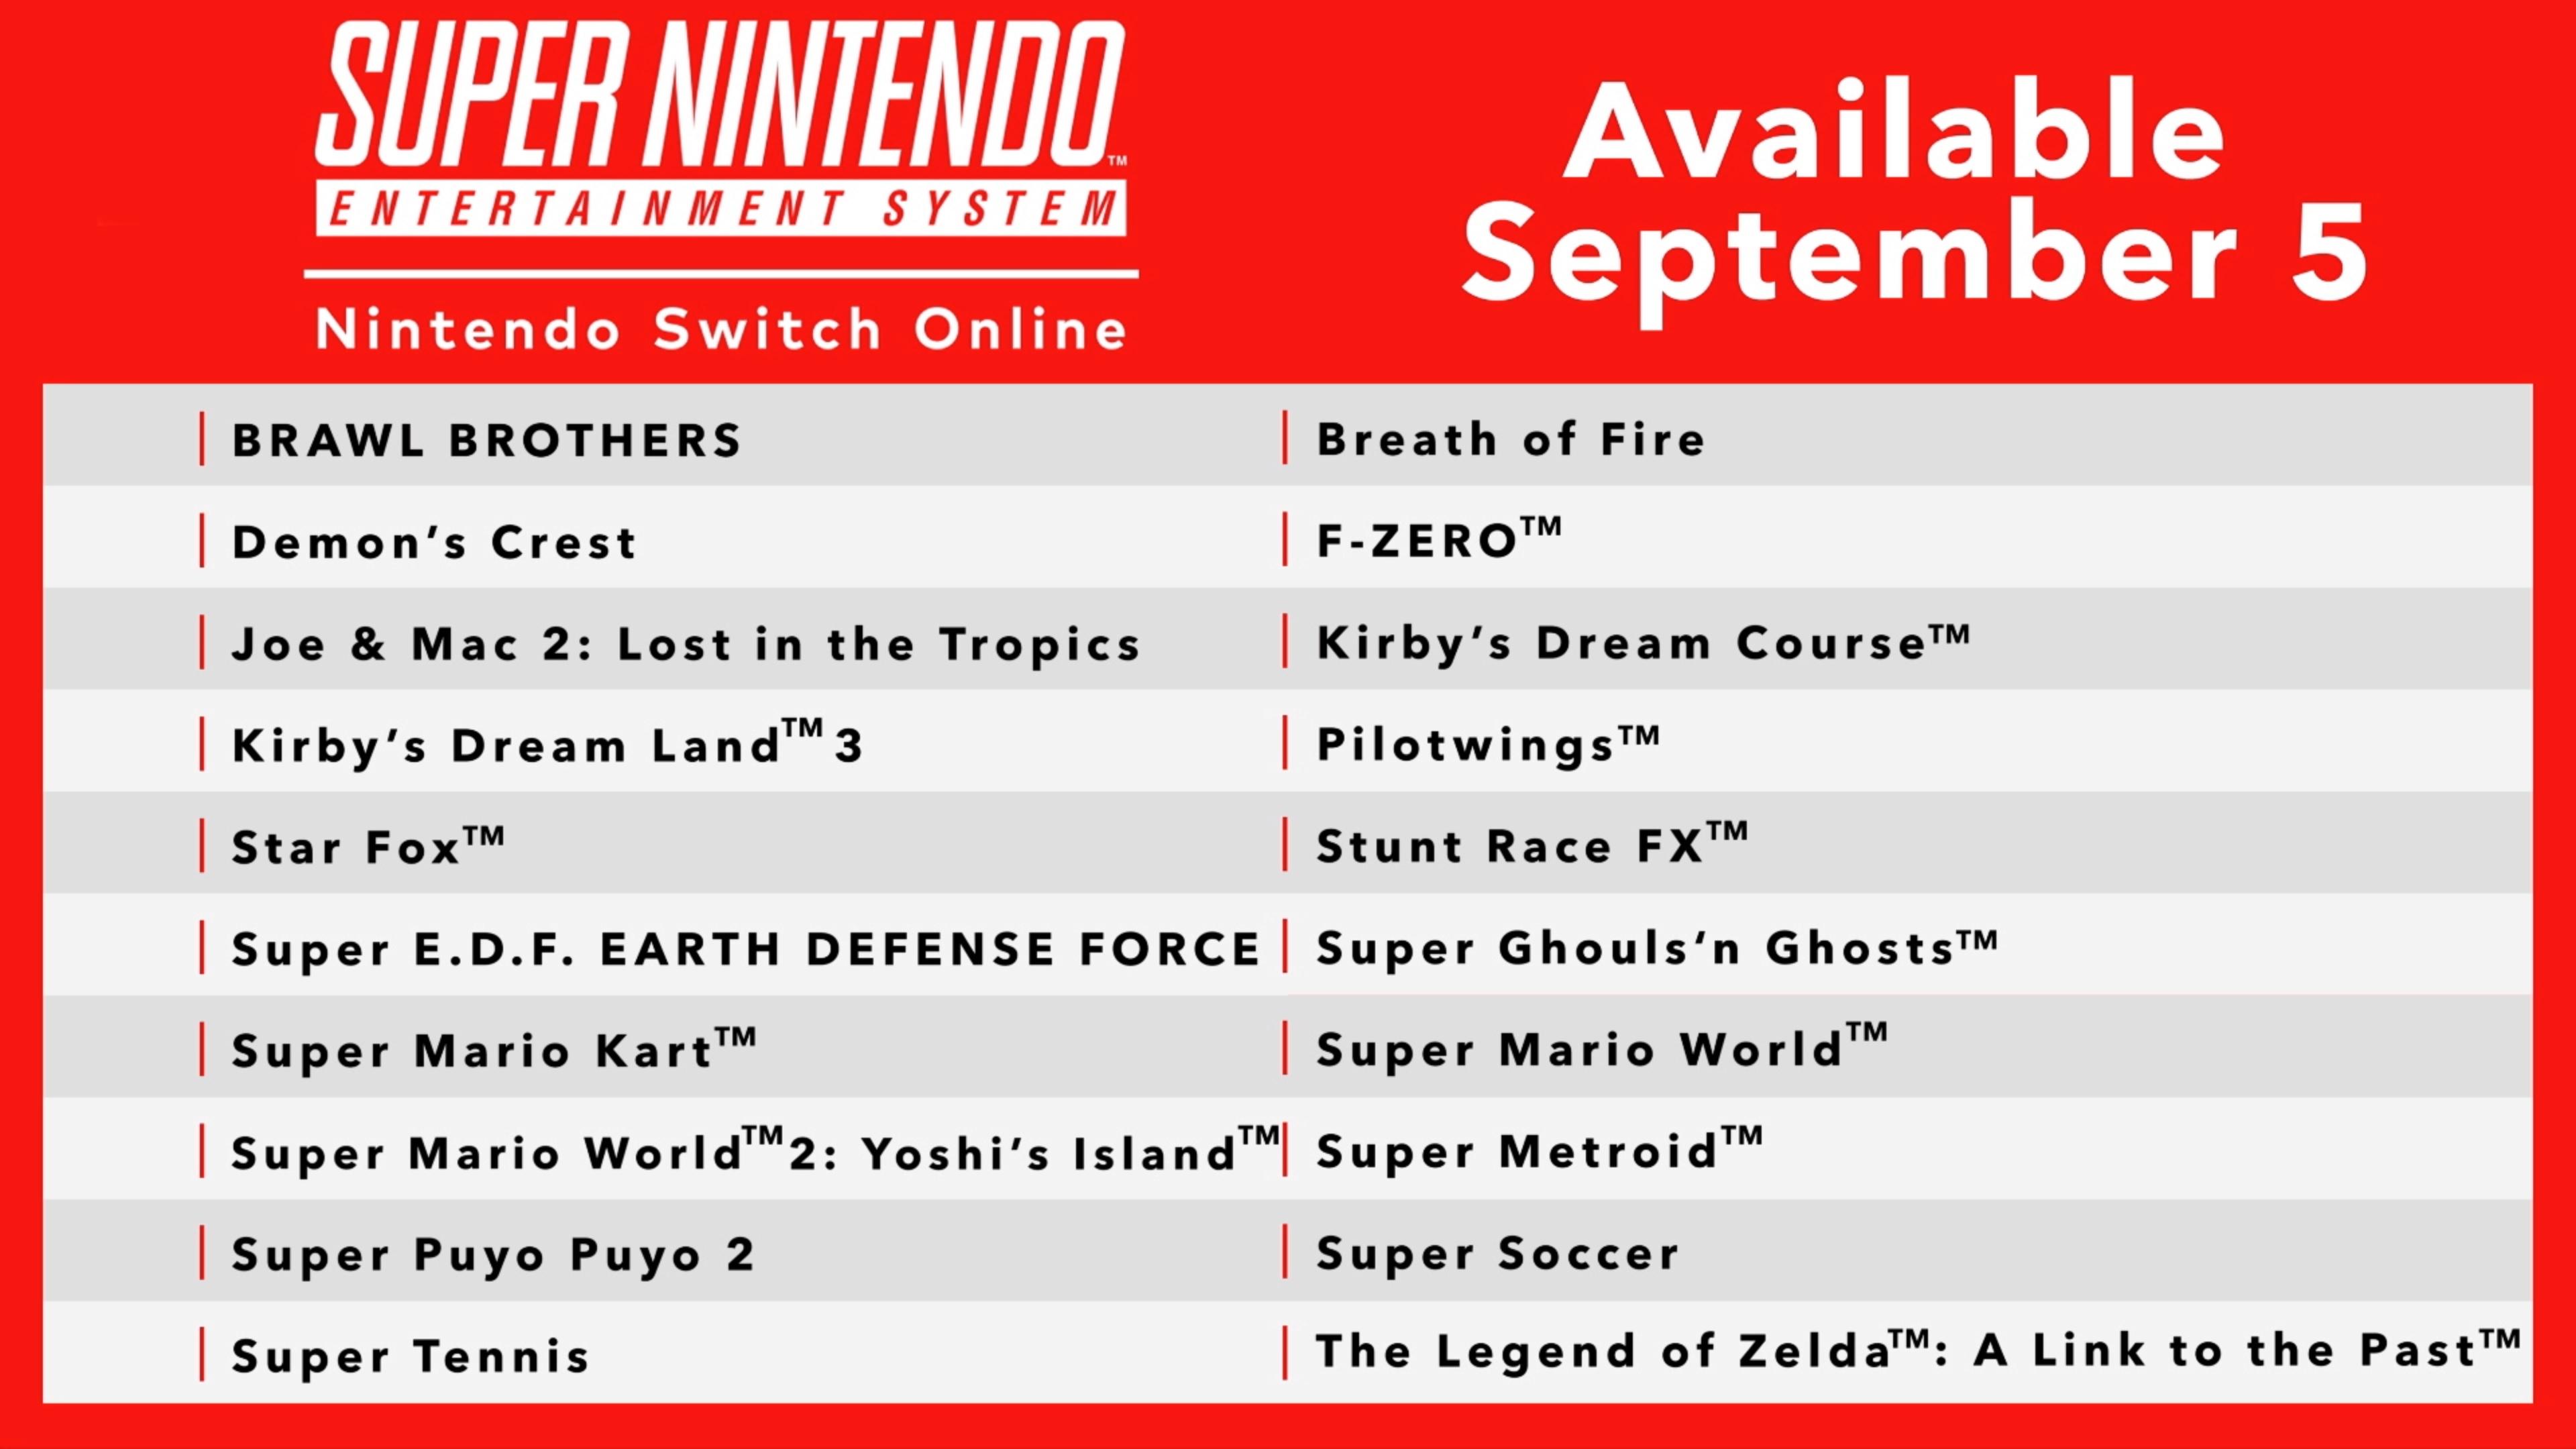 Super Nintendo - Nintendo Switch Online